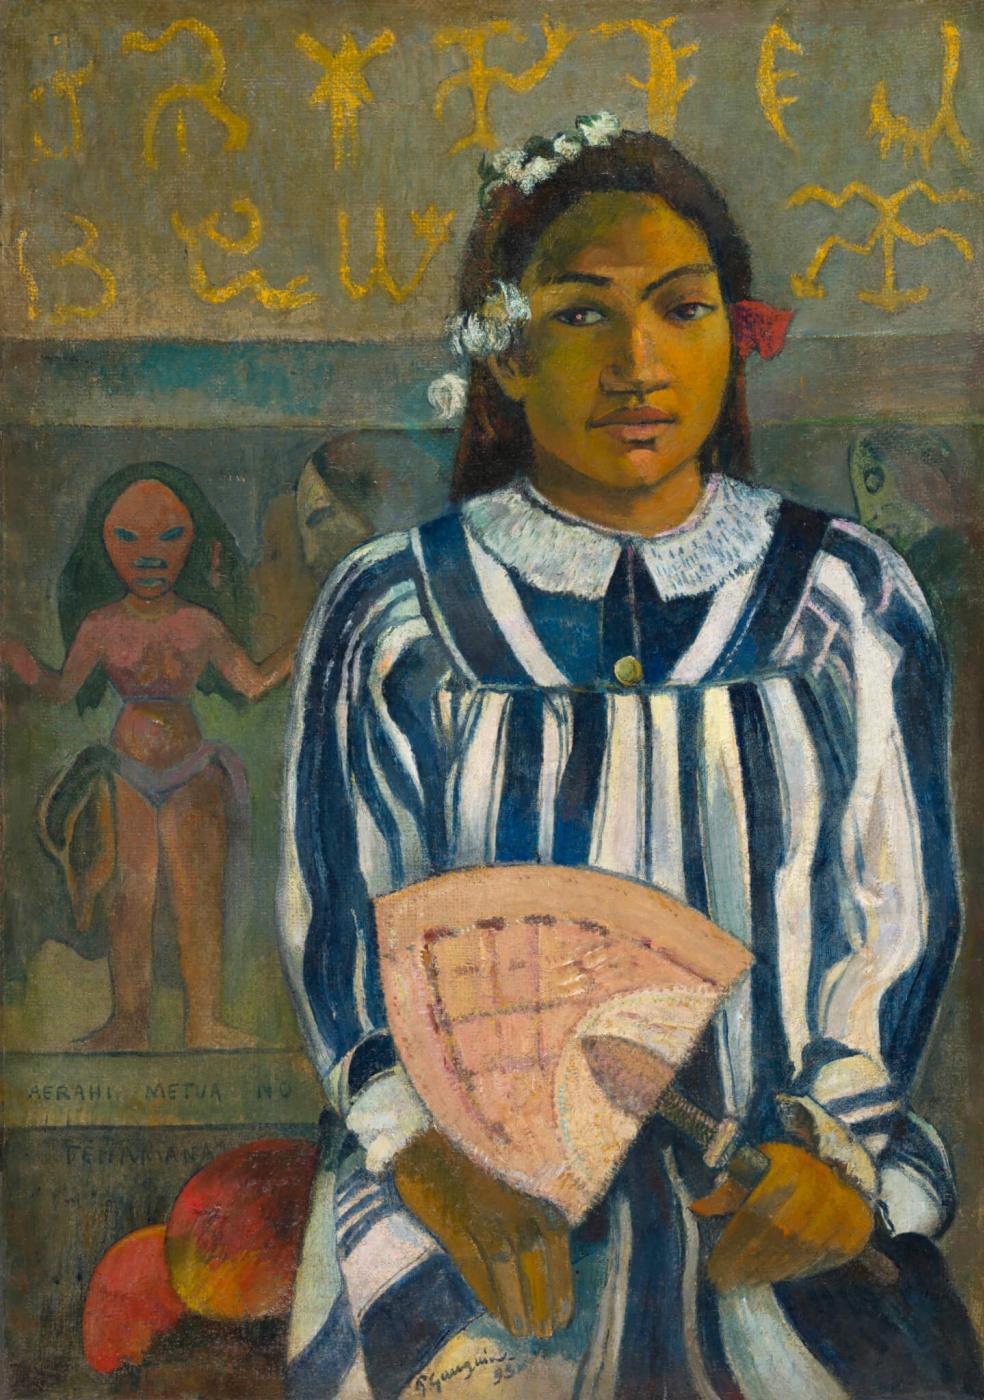 Paul Gauguin. Merahi metua no Tehamana (Tehamana Has Many Parents)